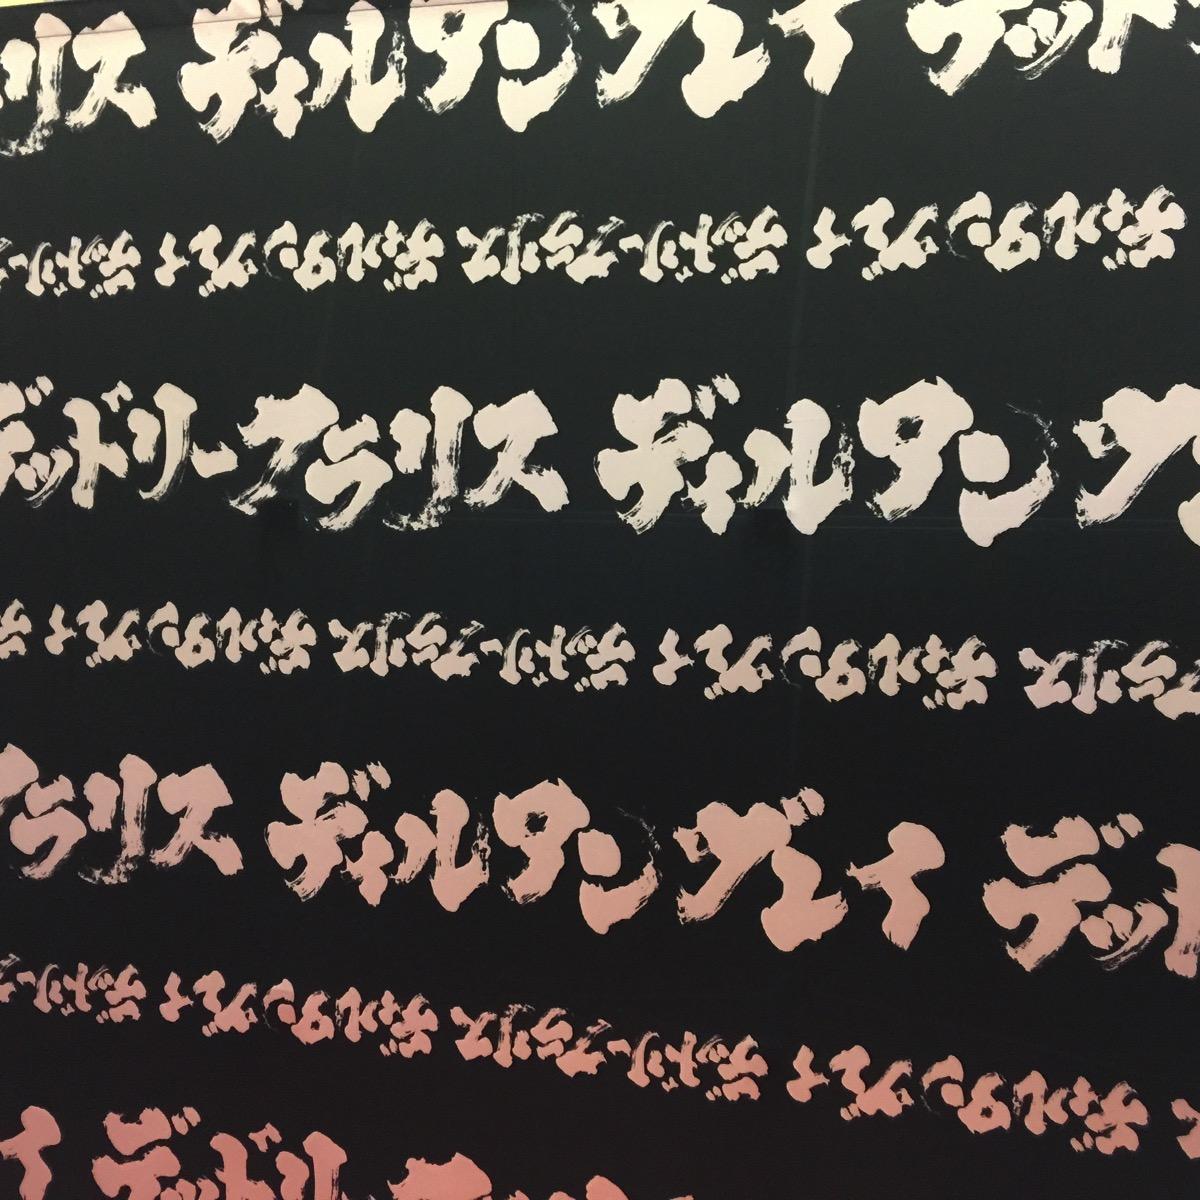 【LIVEレポ】DIR EN GREY TOUR16-17 FROM DEPRESSION TO ________ [mode of DUM SPIRO SPERO]@9/20中野サンプラザ